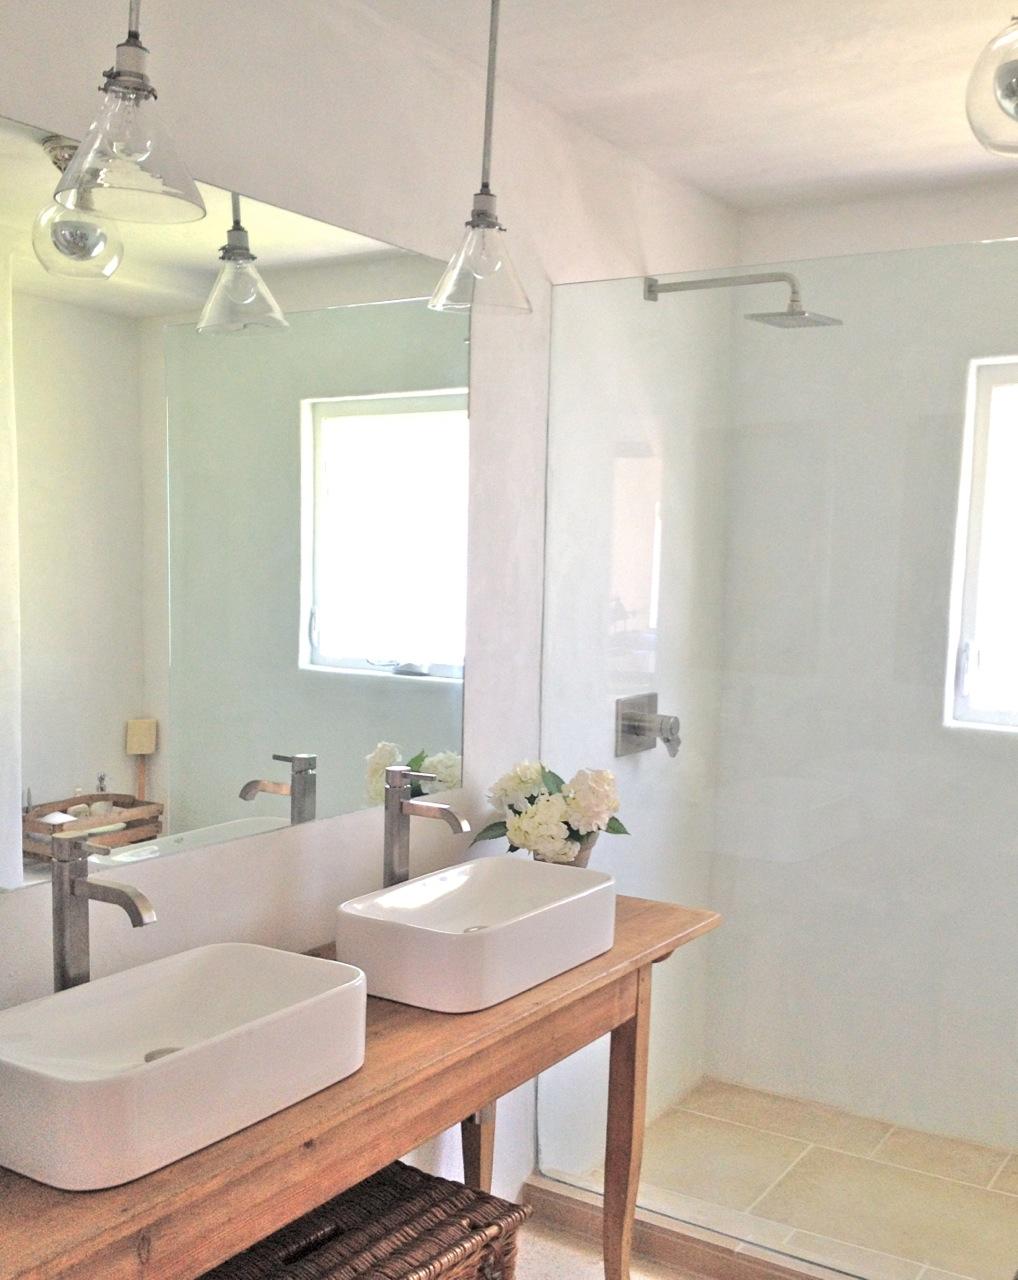 Schoolhouse Pendant Light Bathroom Lighting Designs Ideas pertaining to measurements 1018 X 1280